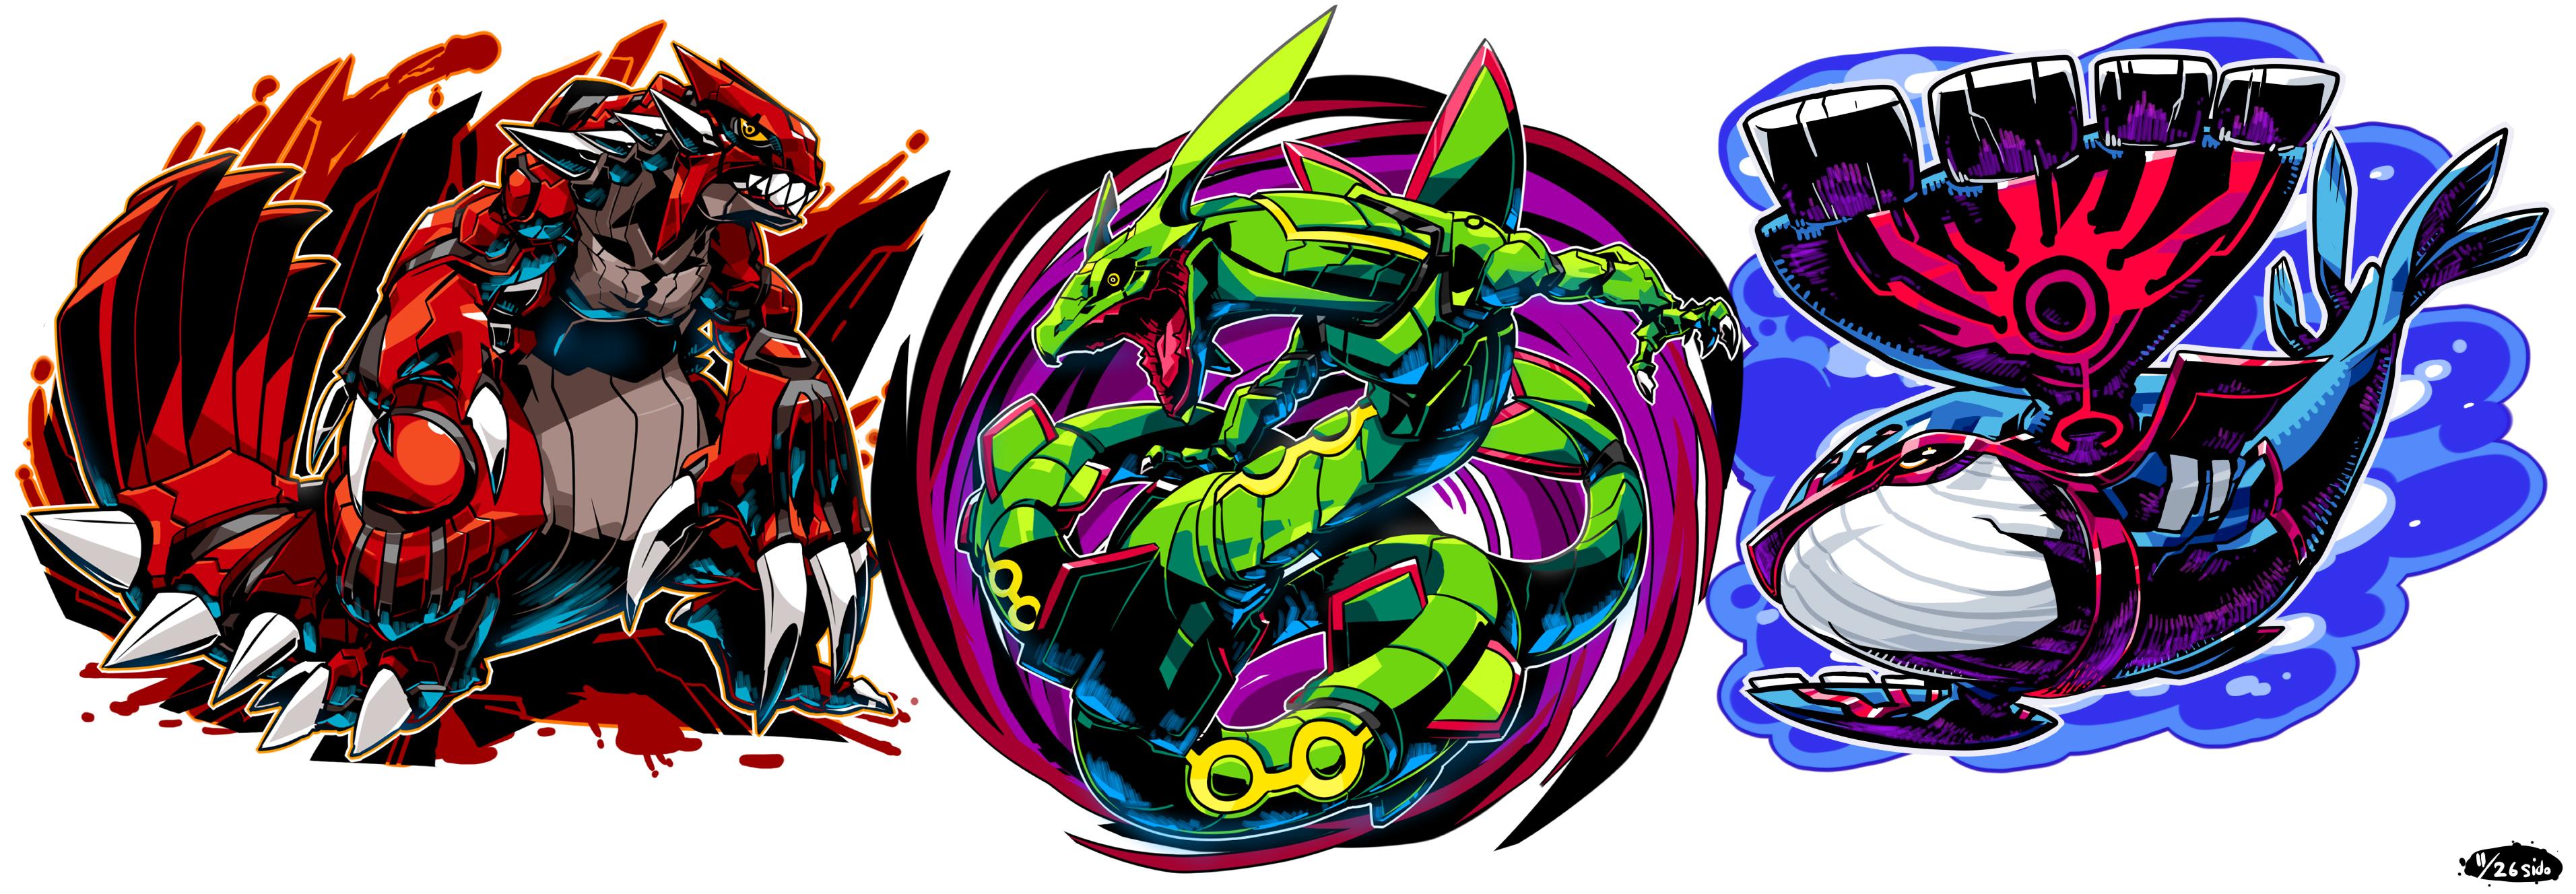 Weather Trio Image 1350443 Zerochan Anime Image Board